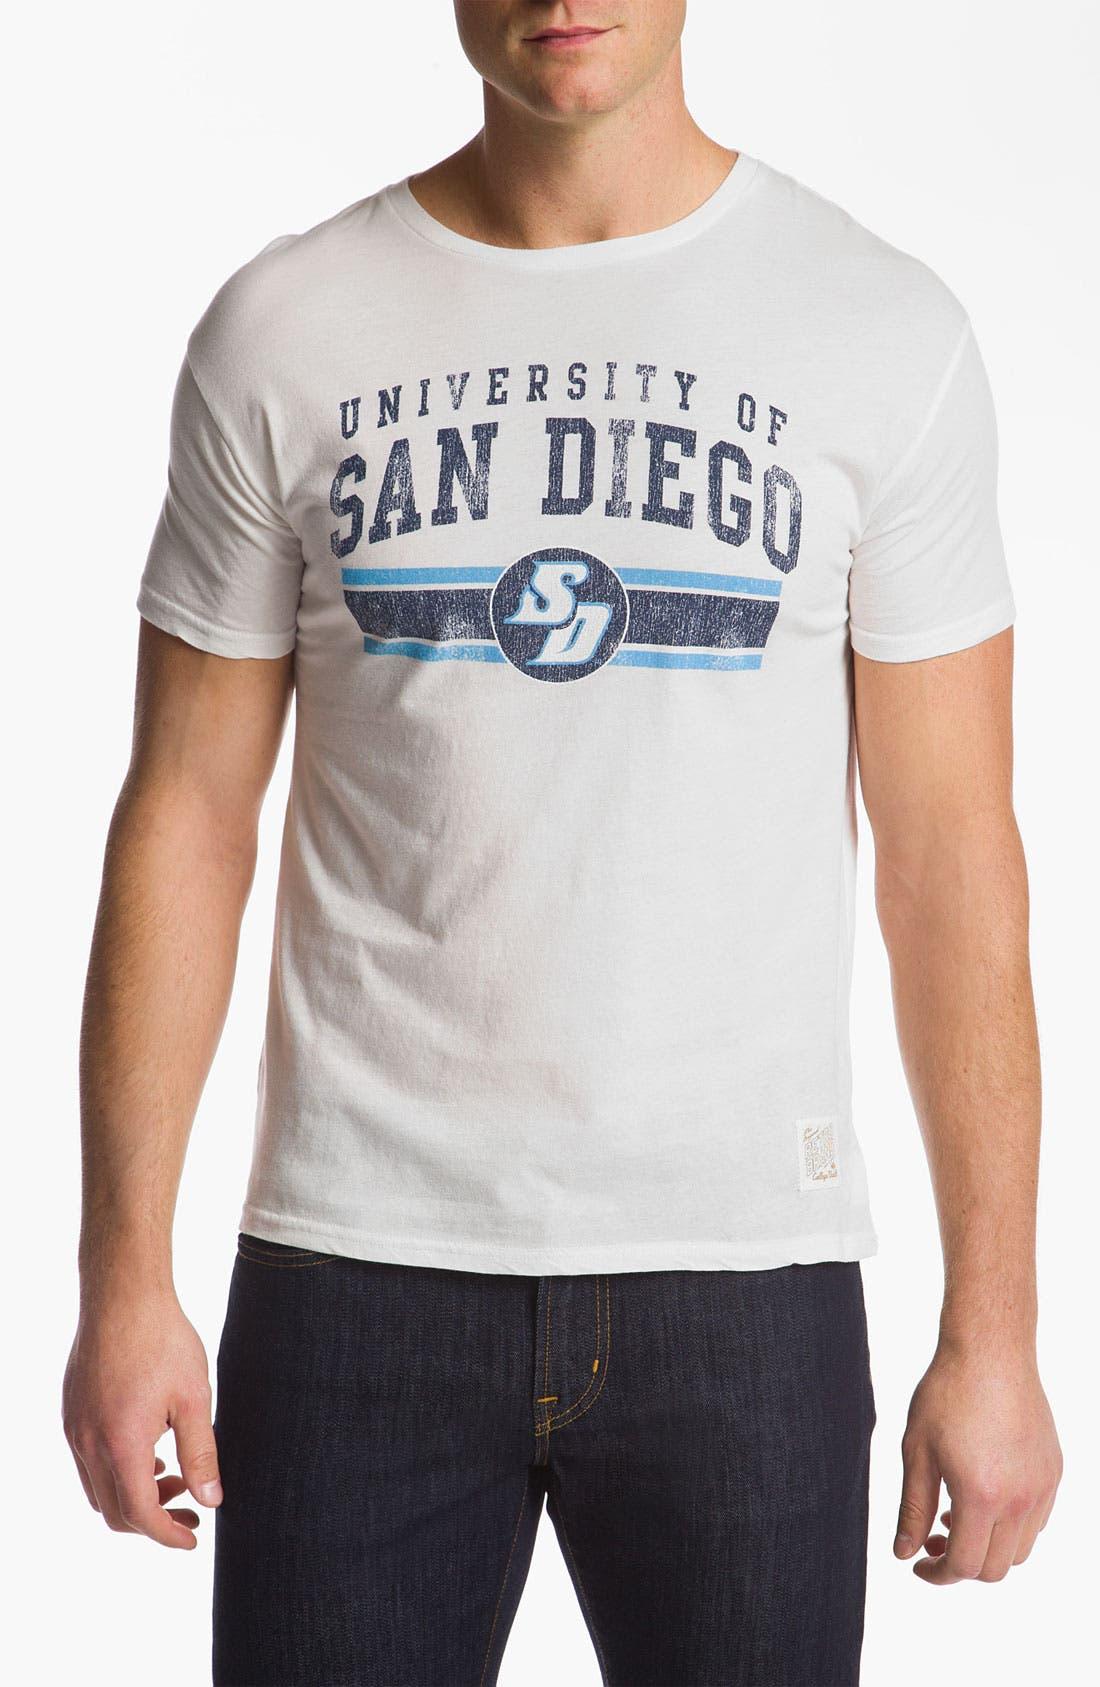 Main Image - The Original Retro Brand 'University of San Diego' T-Shirt